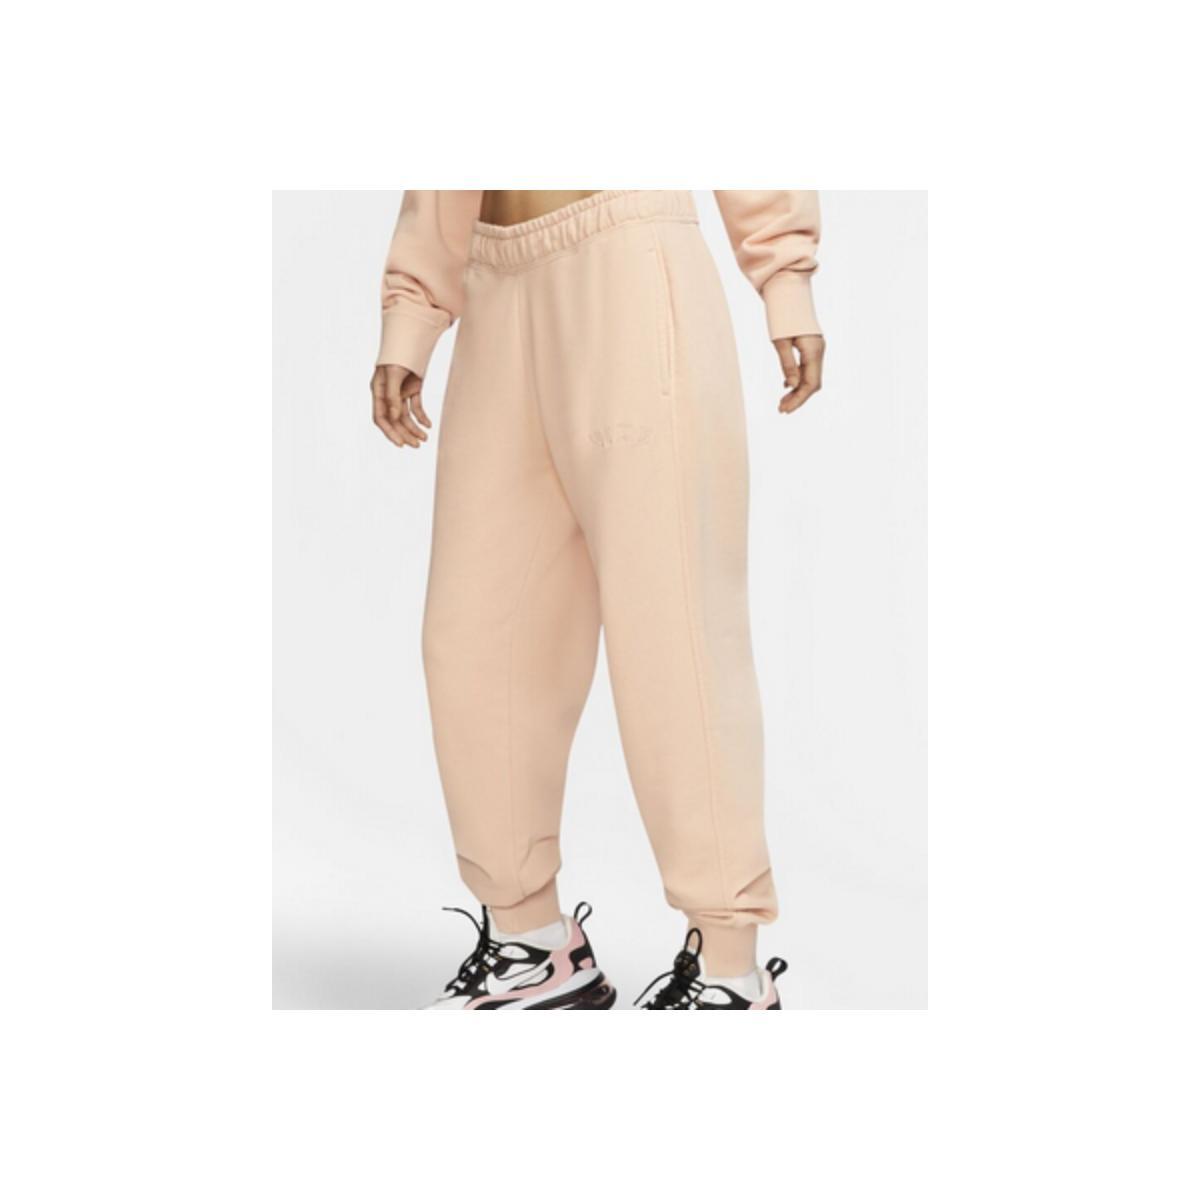 Calça Feminina Nike Cj4115-287 Sportswear Nude